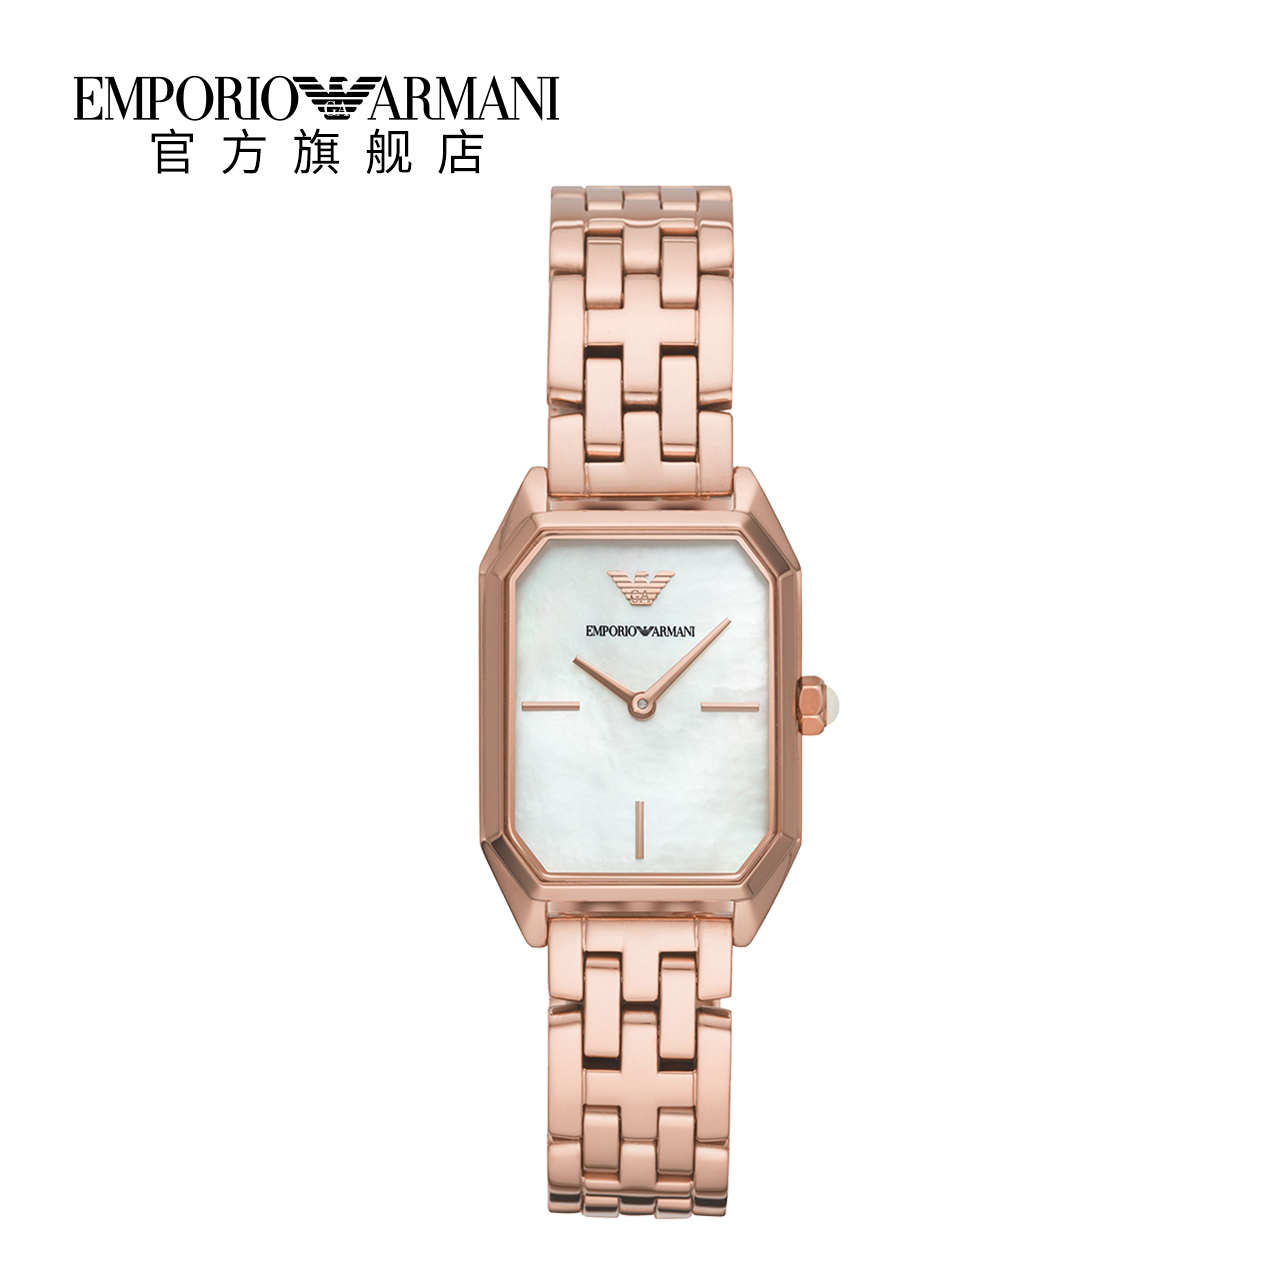 Armani 阿玛尼旗舰店正品通勤气质方形手表 钢带经典女表AR11147